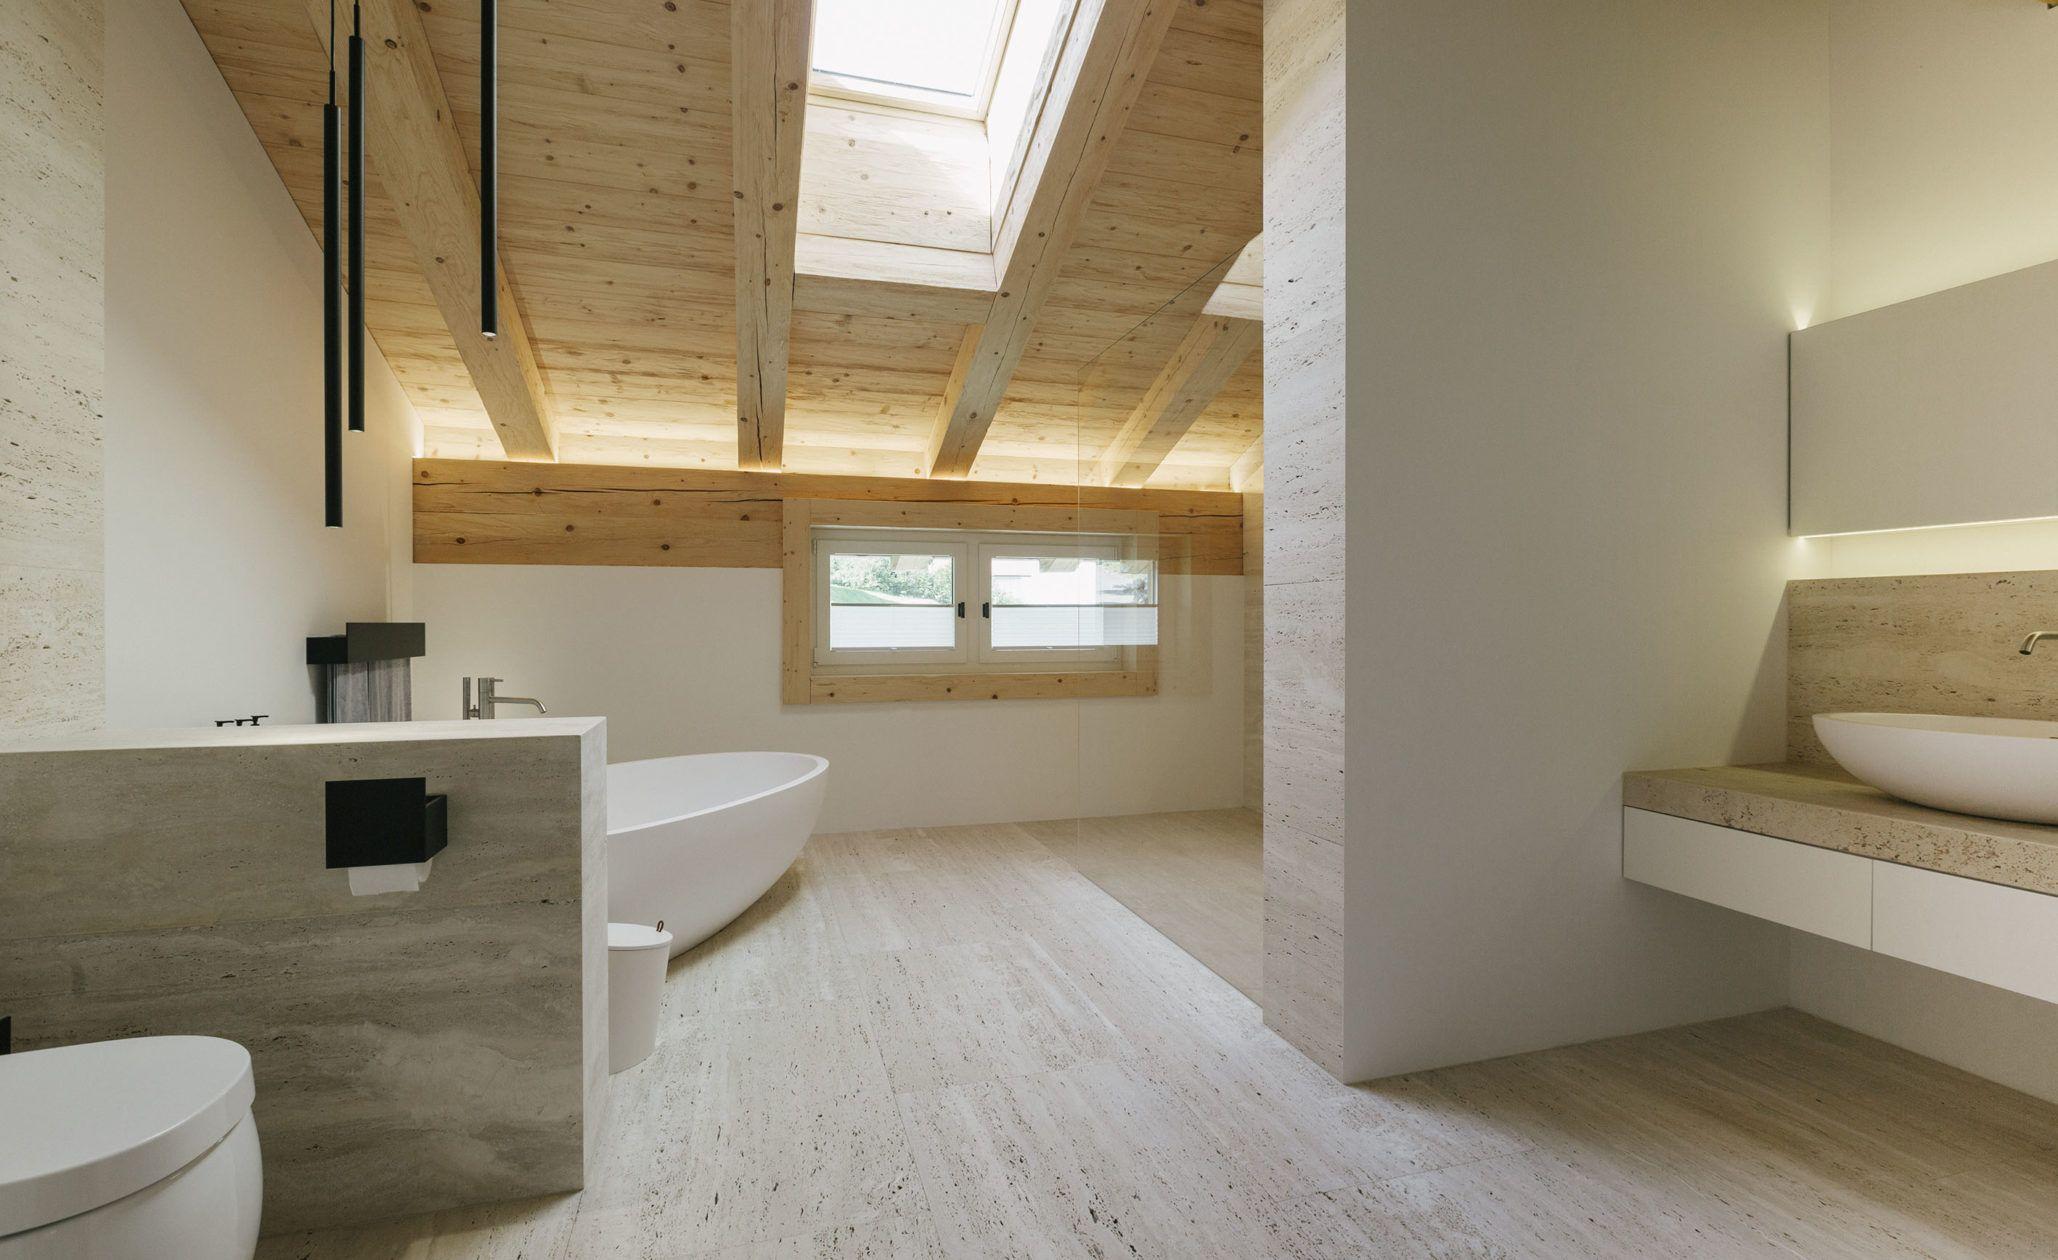 Naturstein Badezimmer Ideen - Wohndesign -